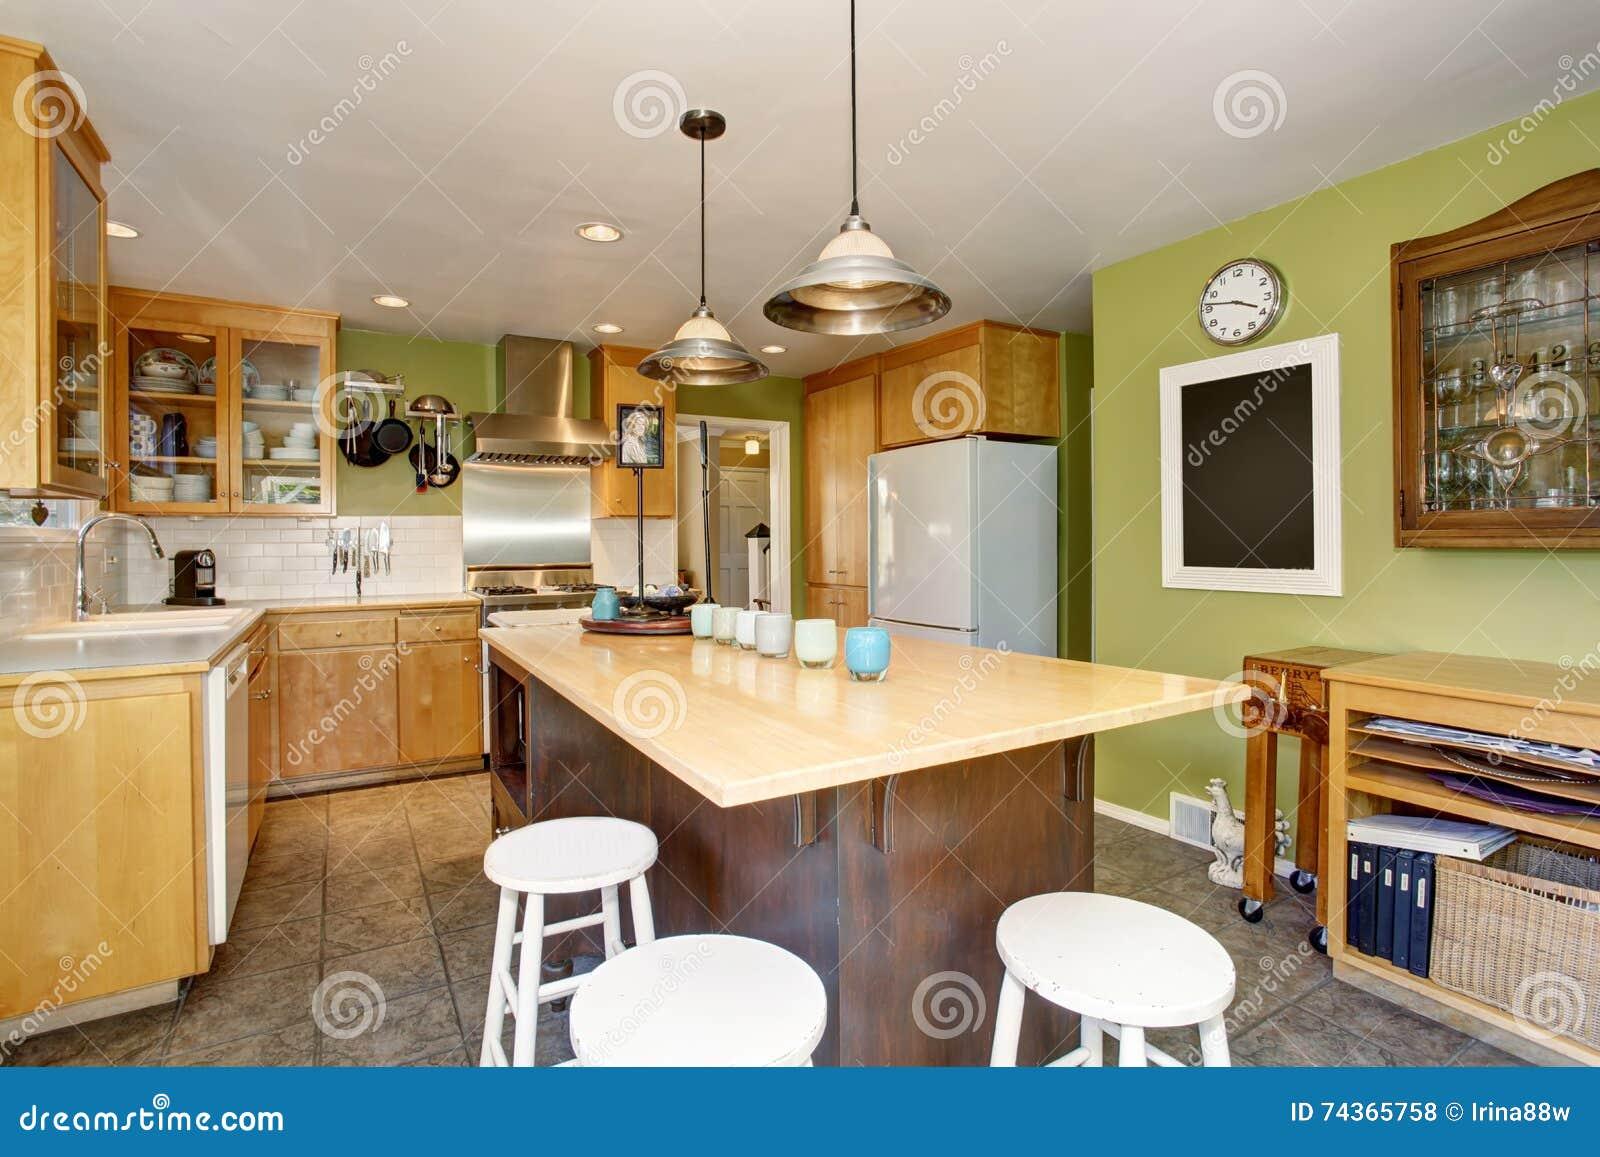 Keuken witte kookeiland - Optimaliseer de keukenruimte ...